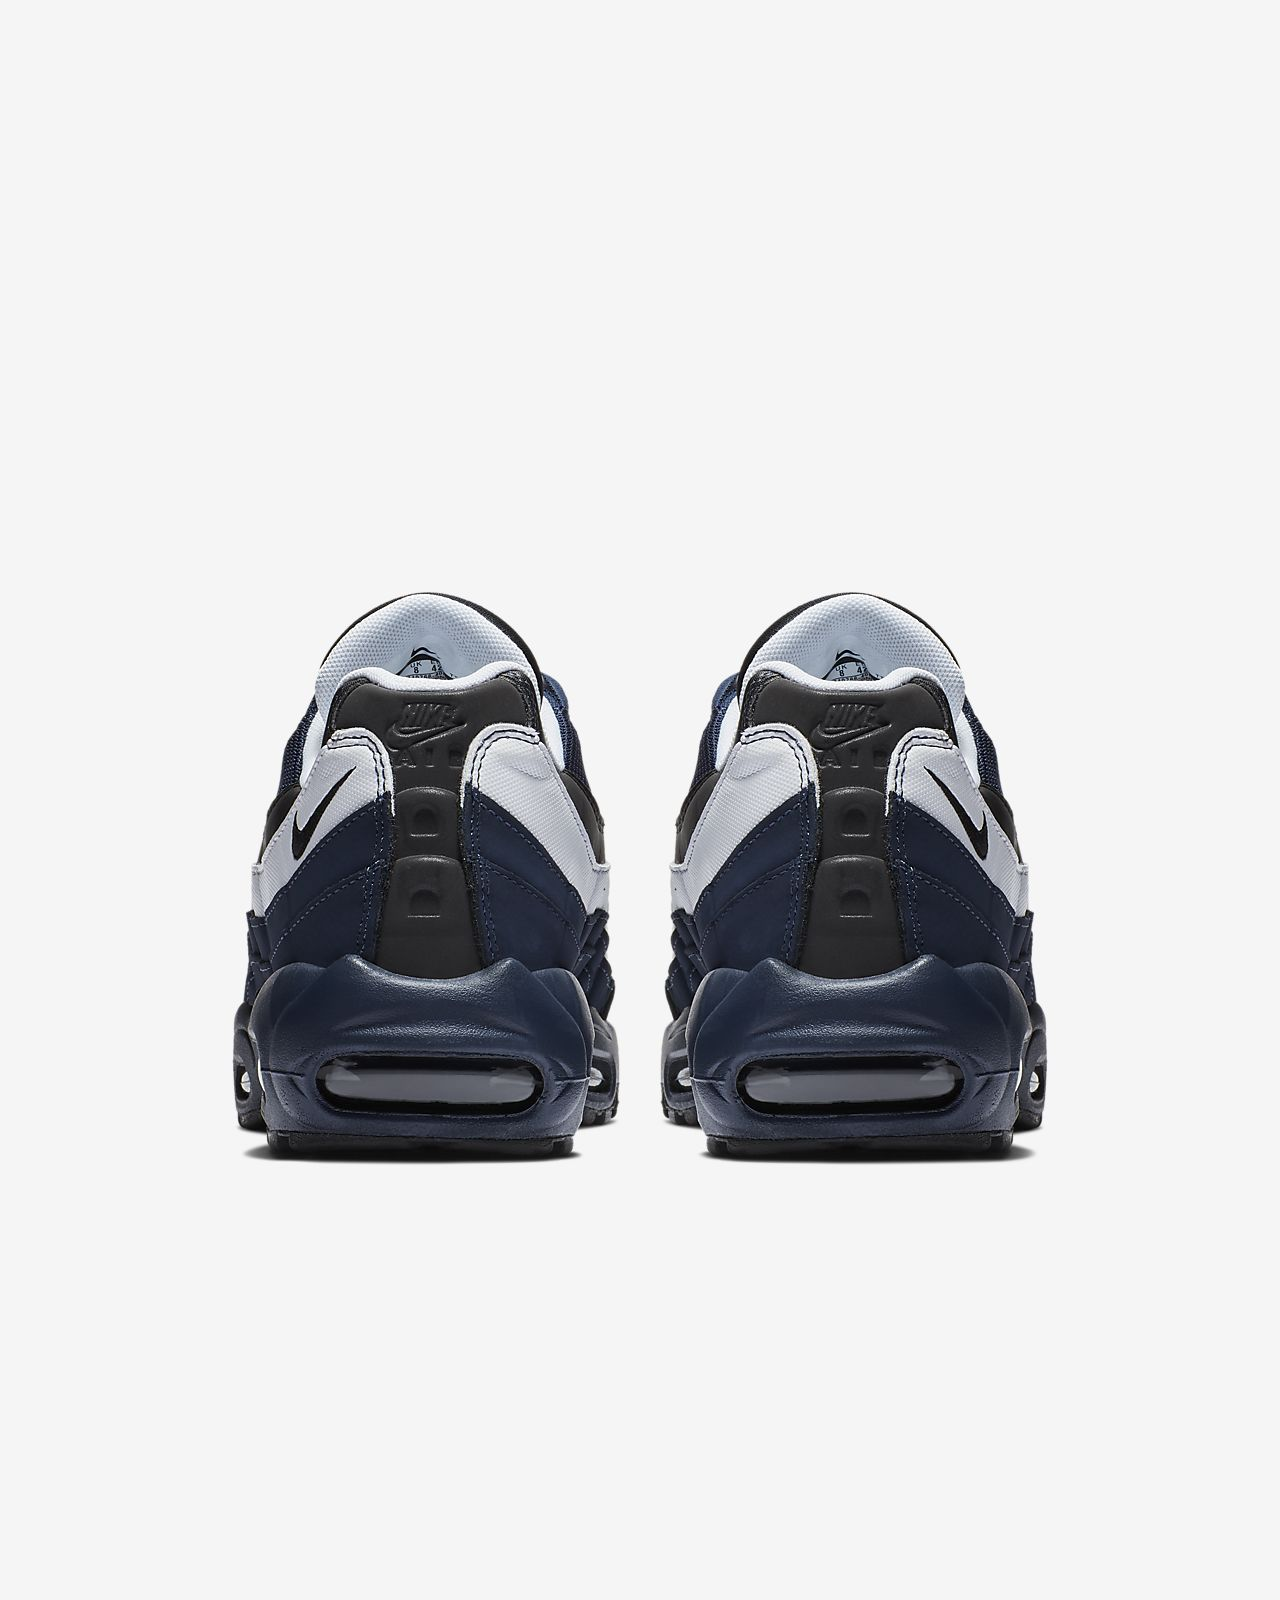 buy online a682c 19c1c ... Nike Air Max 95 Essential Mens Shoe